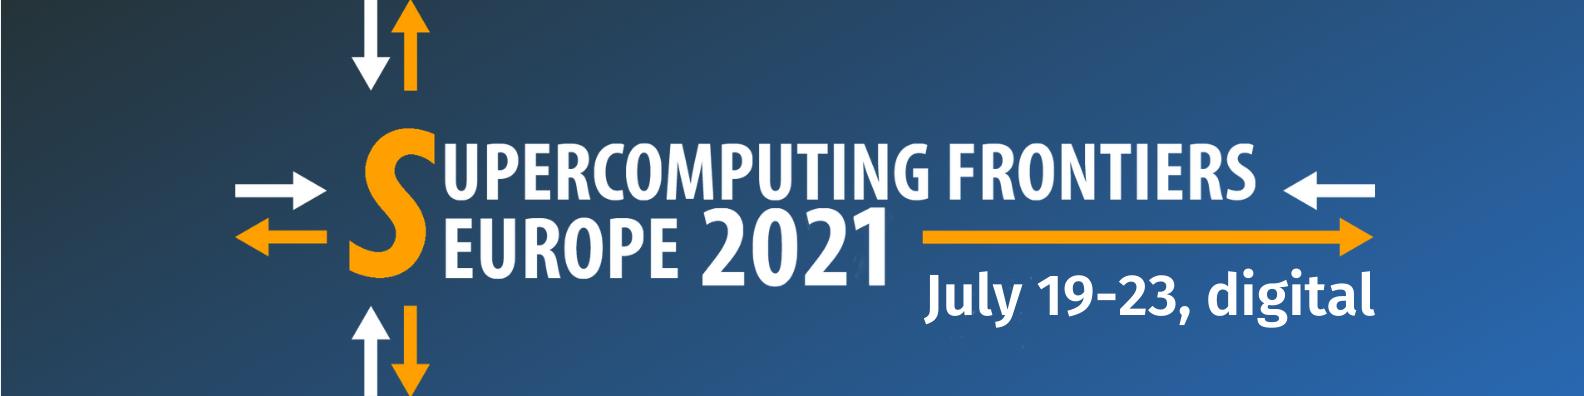 Supercomputing Frontiers Europe 21, July 19-23 digital